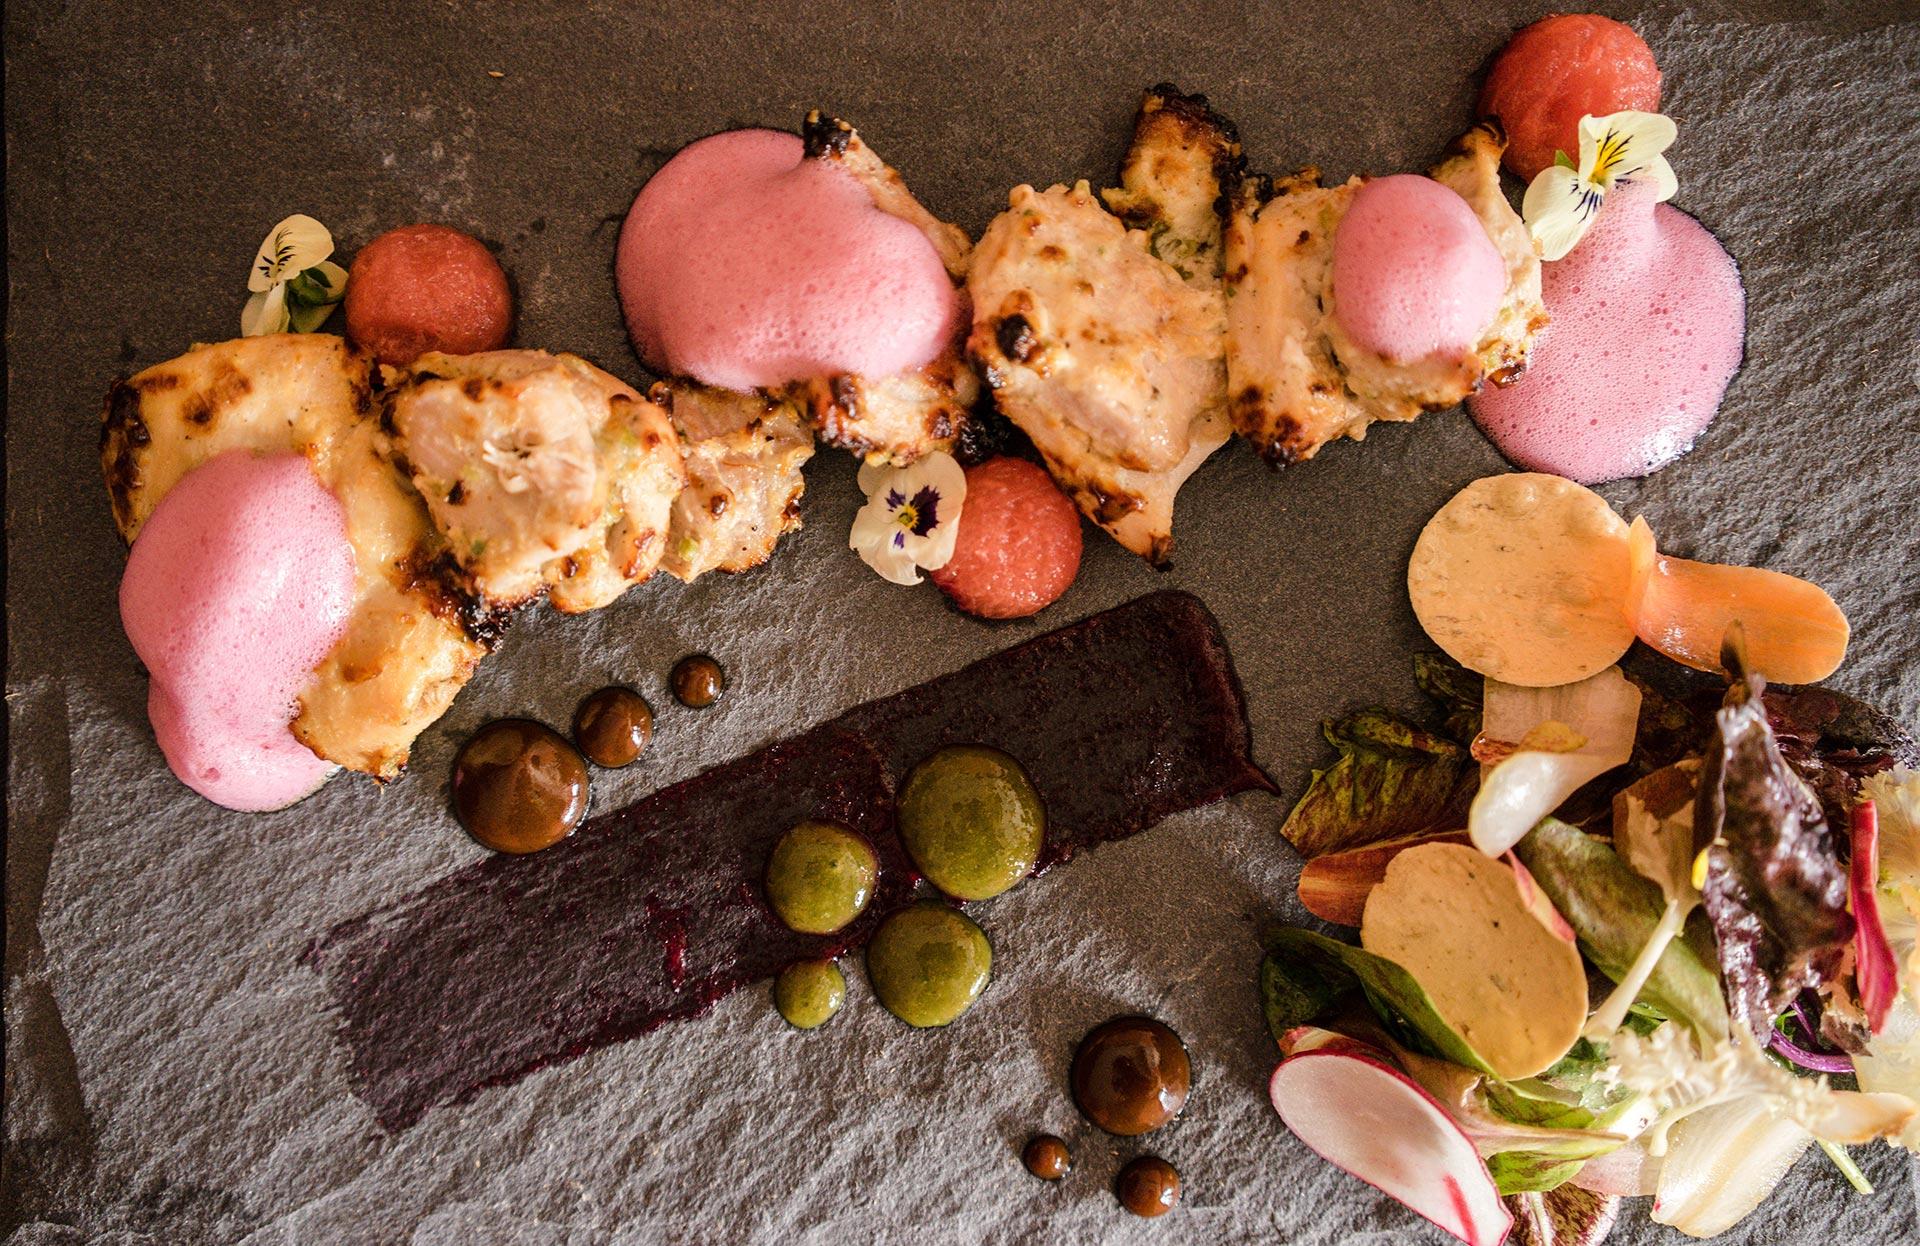 keeva-sf-restaurant-food-photographer-a-few-good-clicks-60.jpg